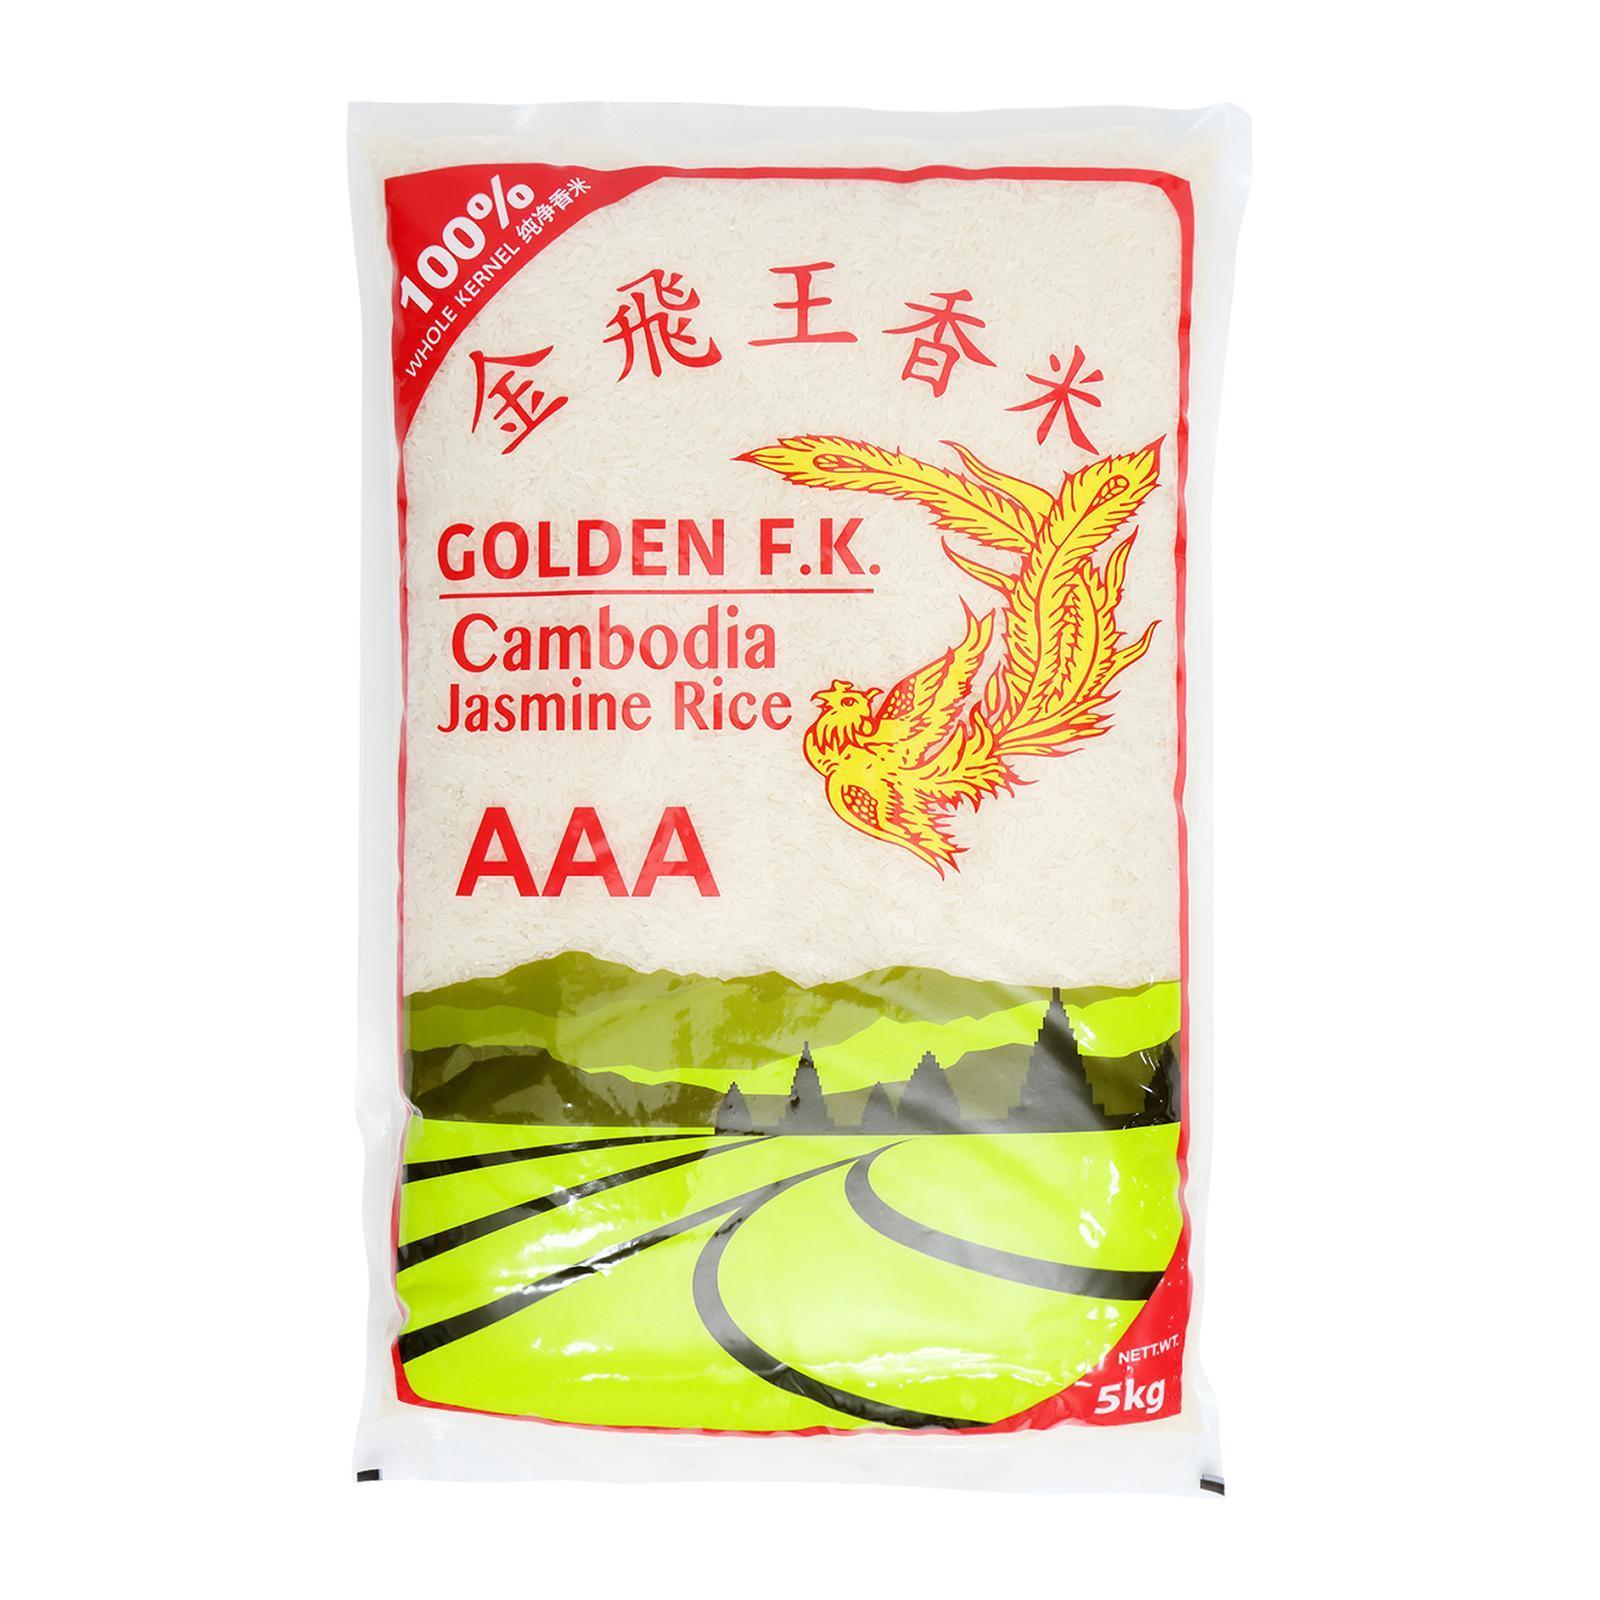 Golden F.K. Cambodia Jasmine Rice 5 KG